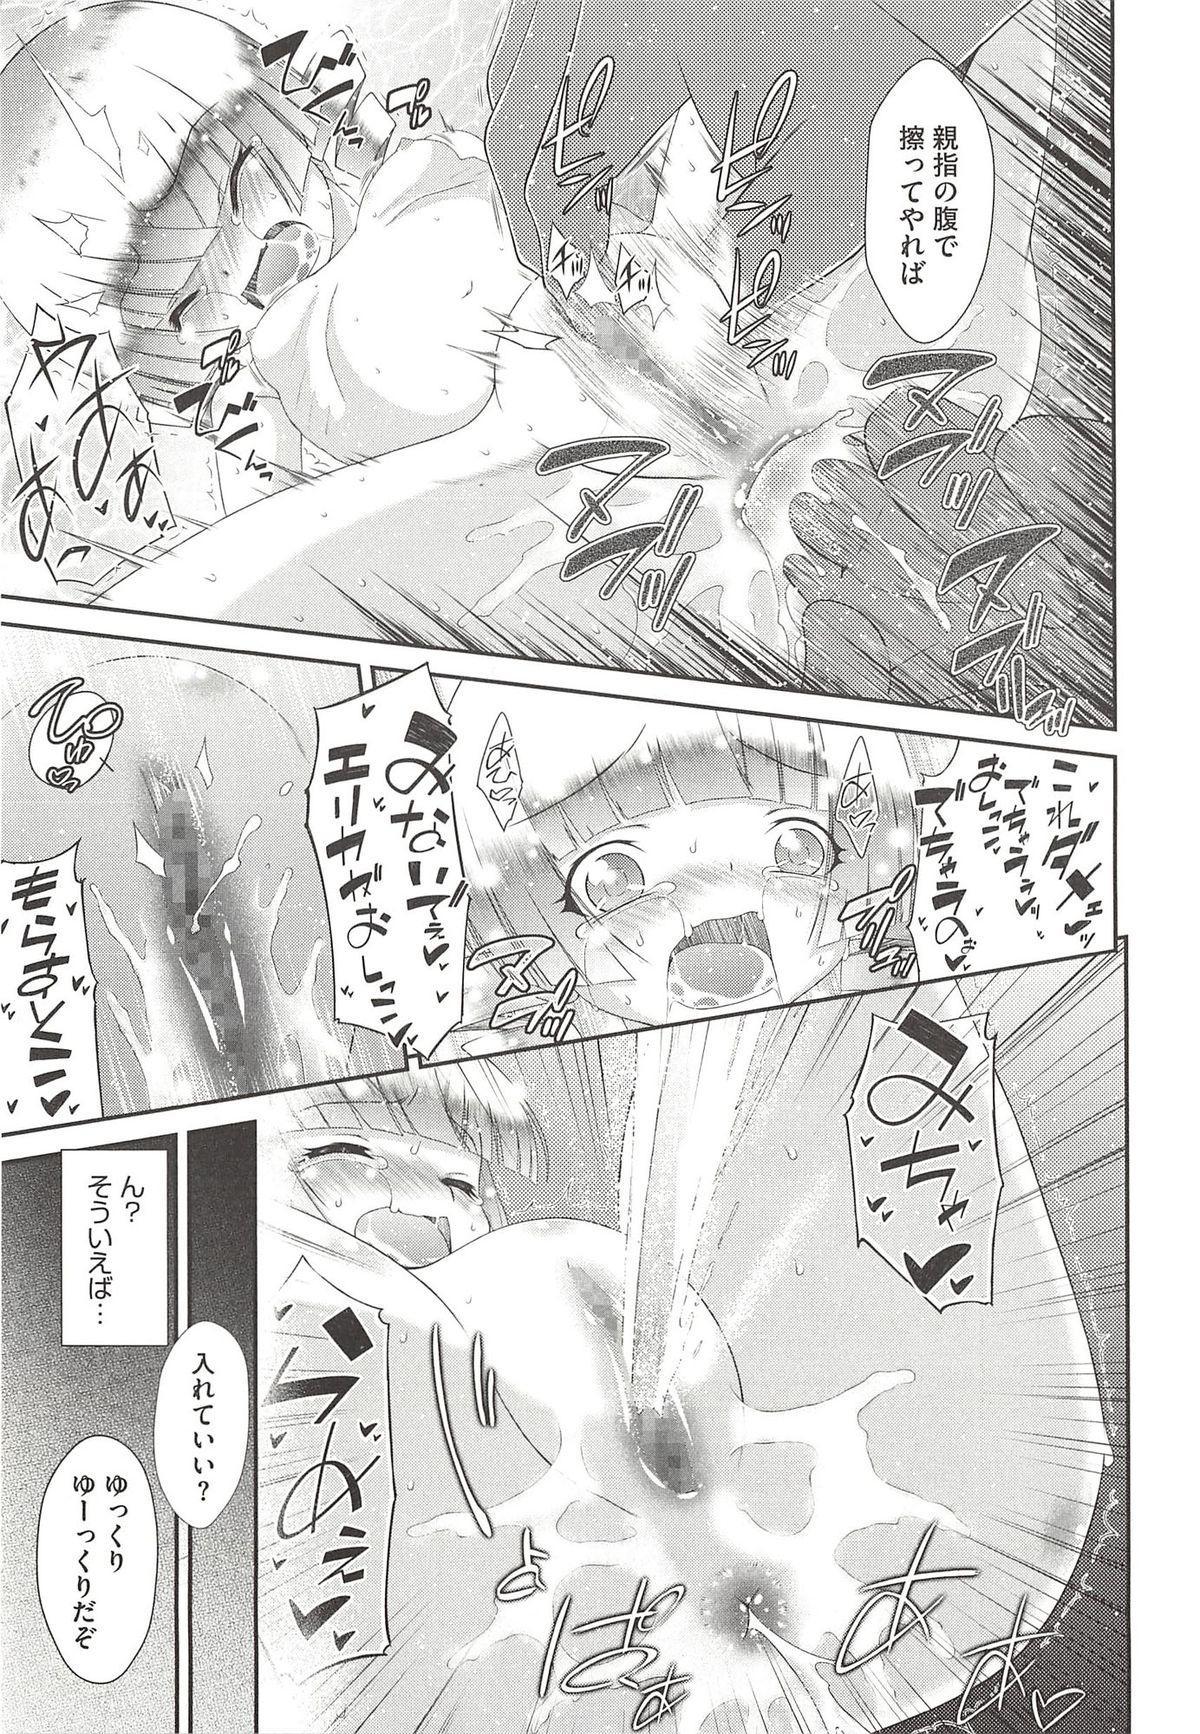 Itazura Time 54